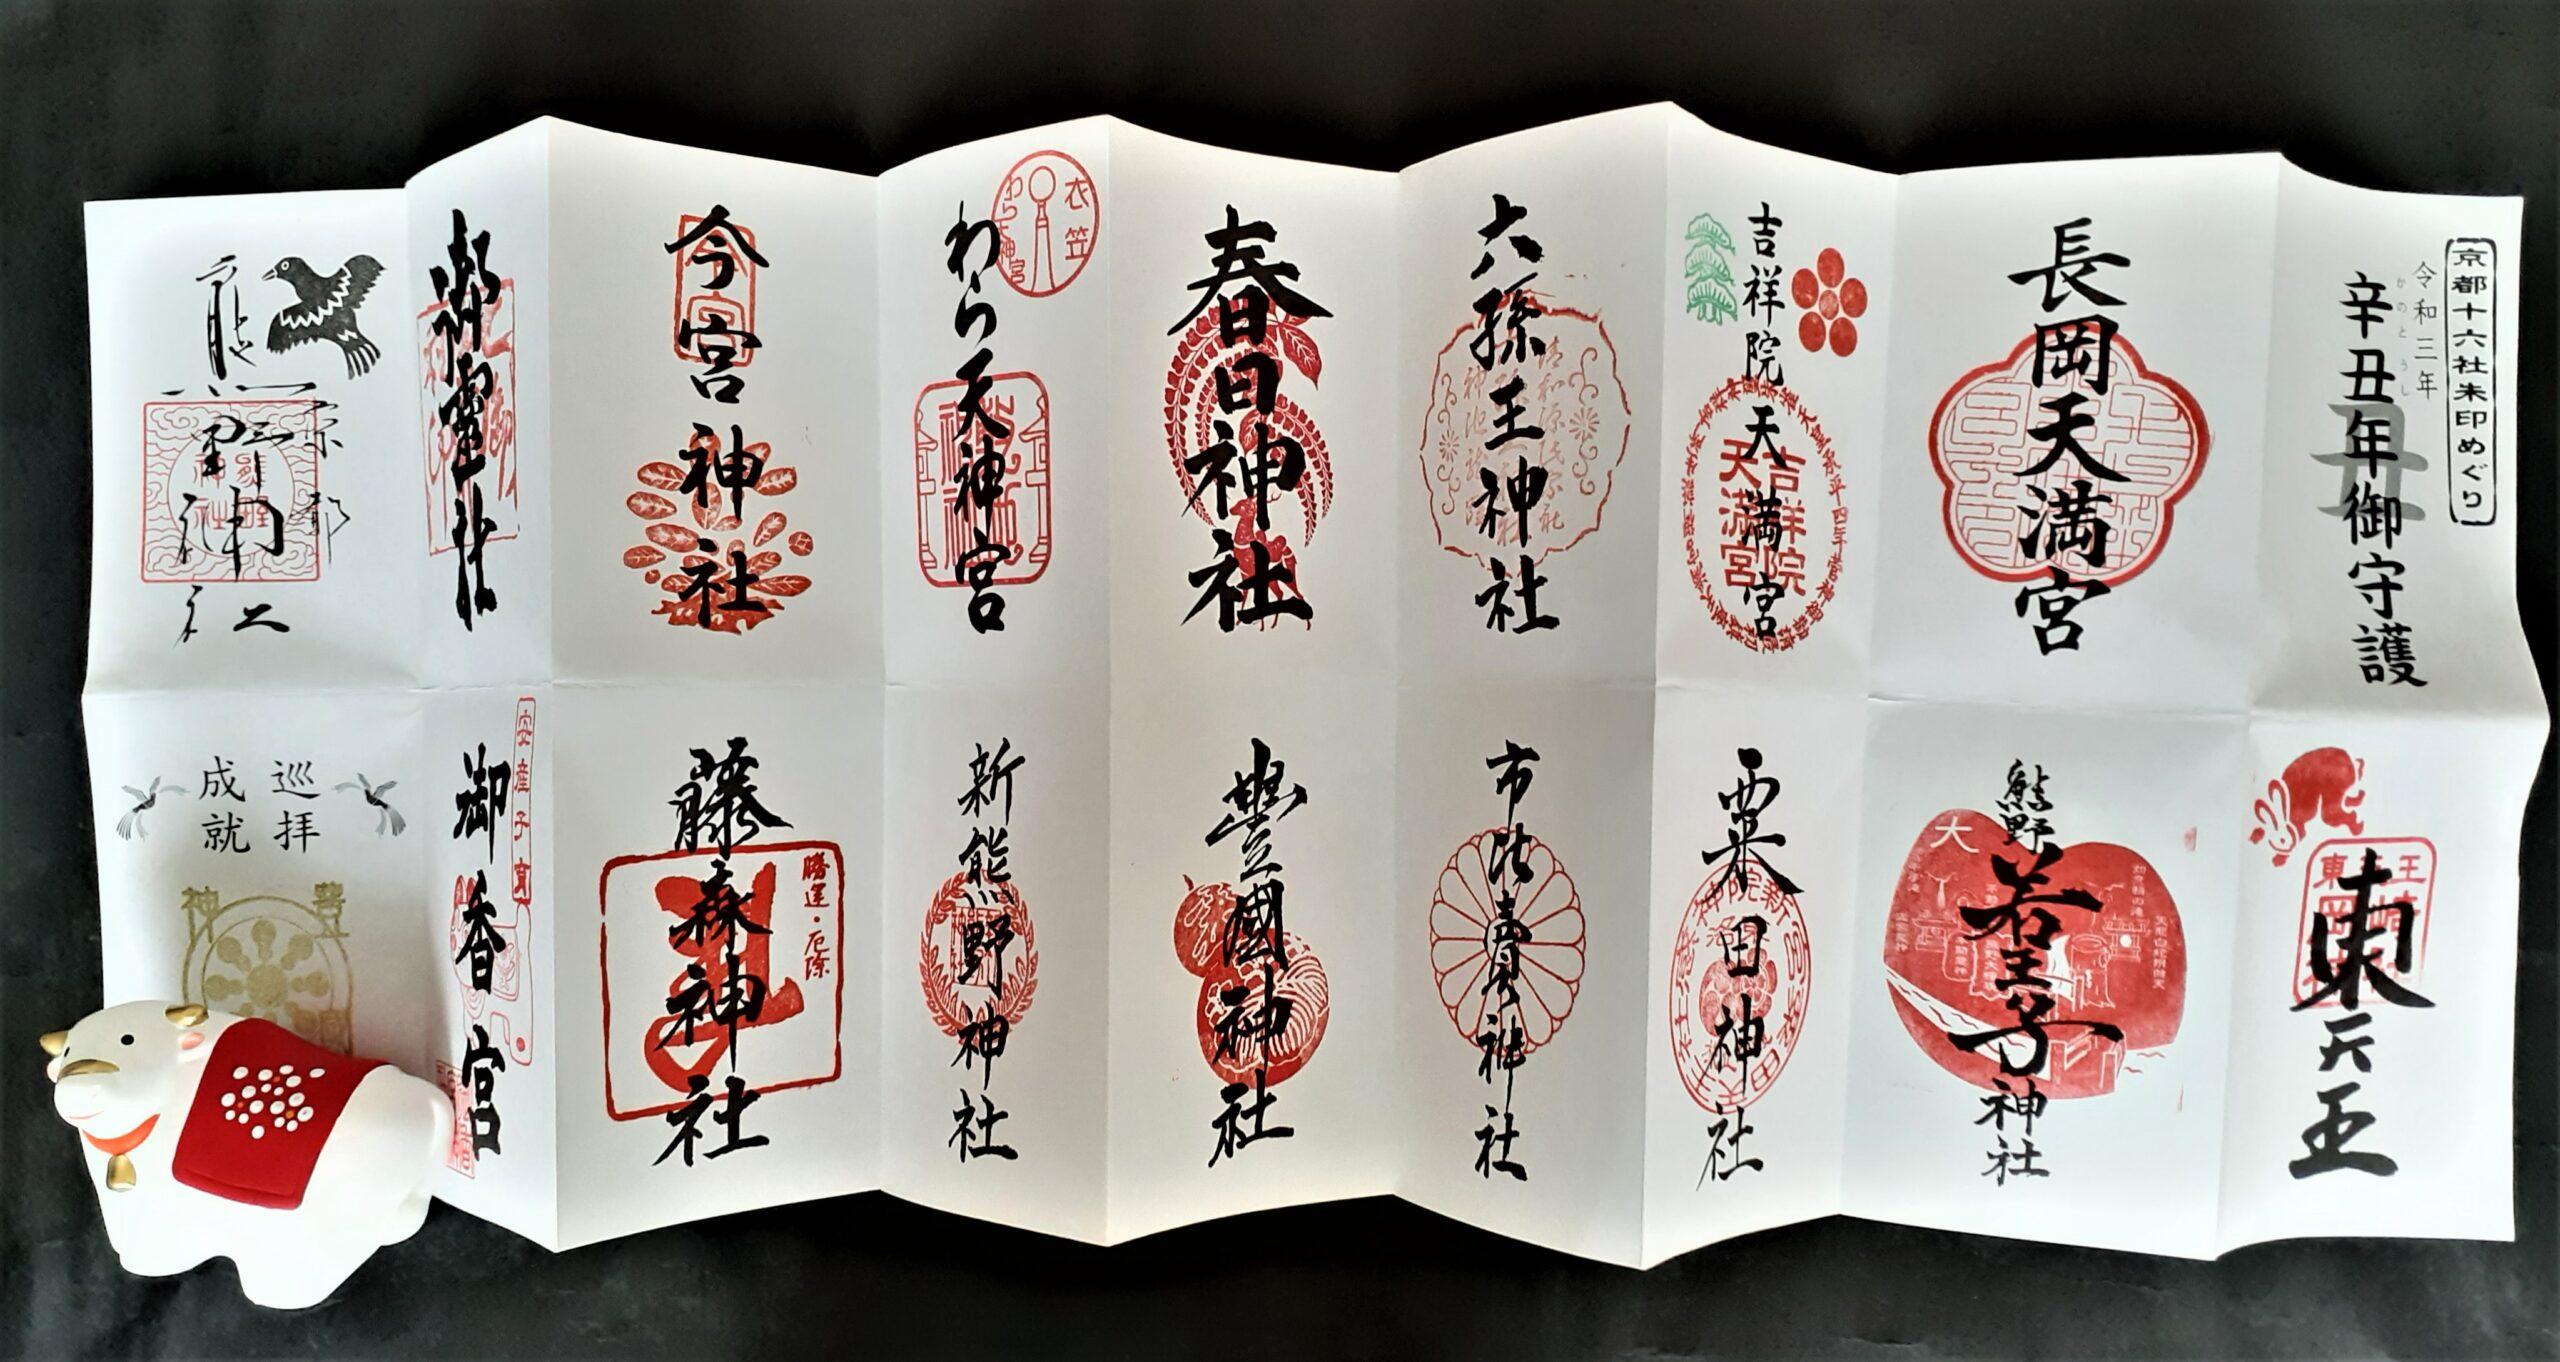 京都 十六社 巡り 御朱印